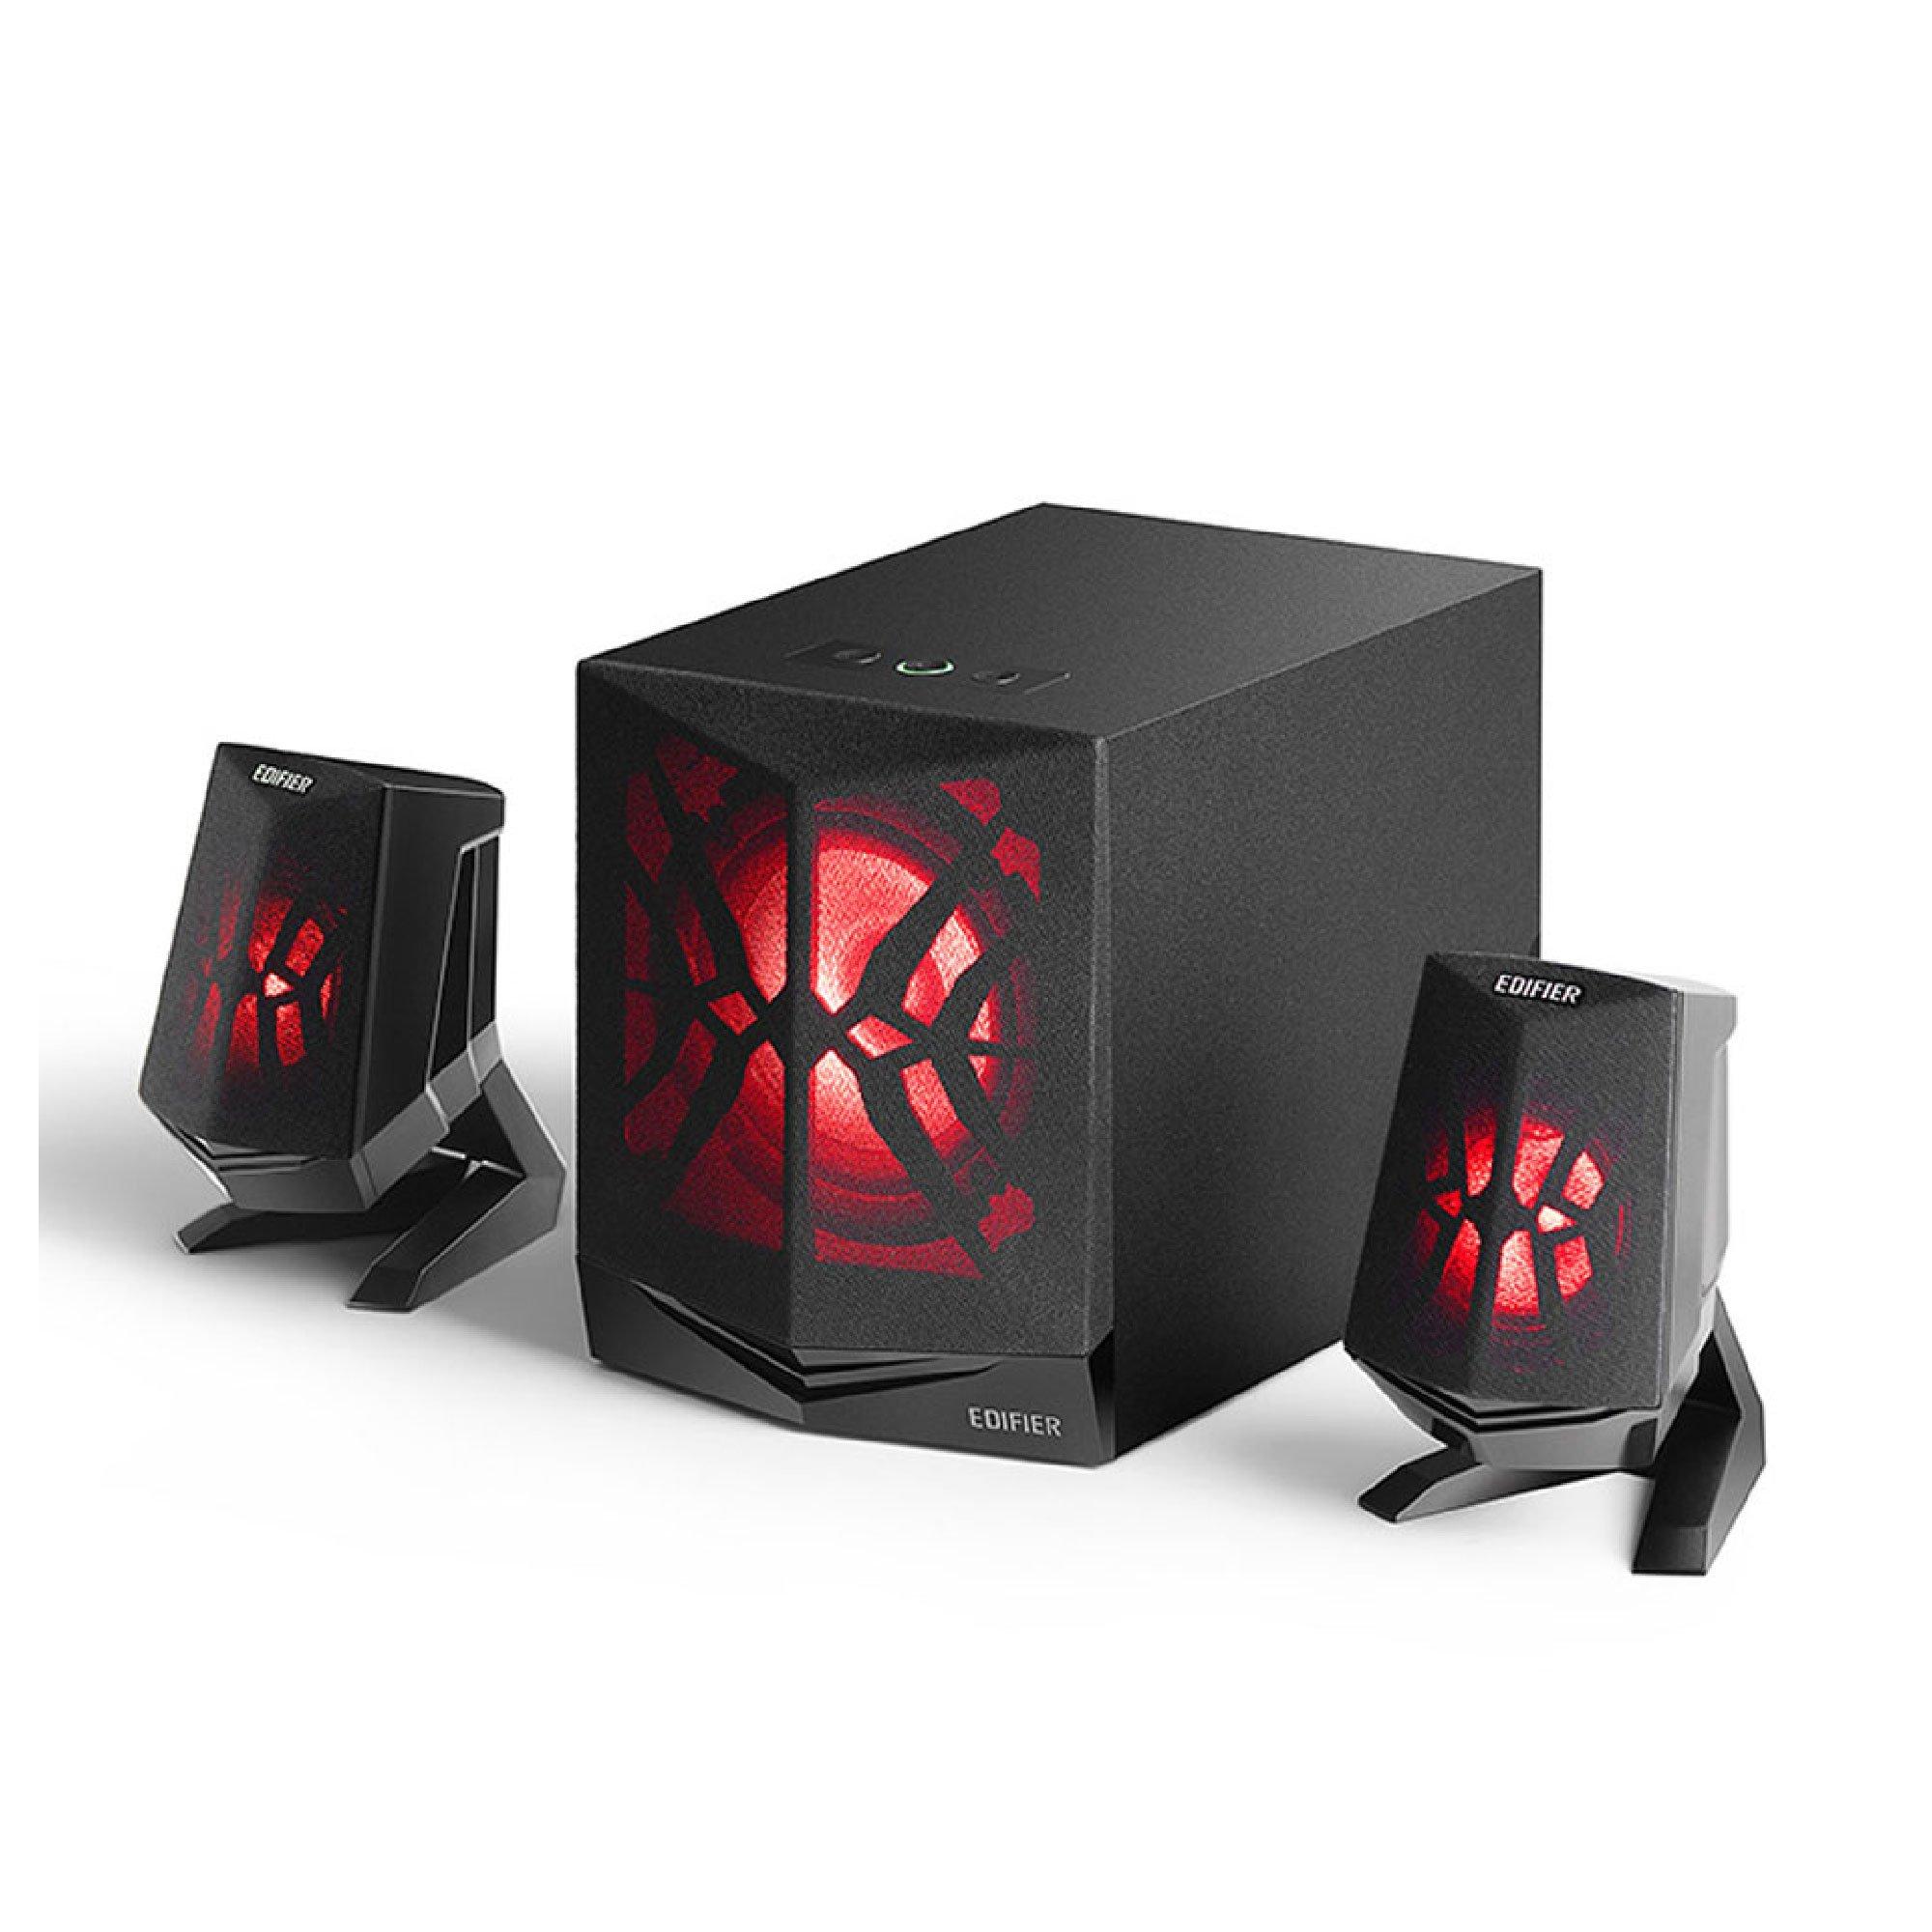 Gaming Rgb Speaker Edifier X230 2 1 Multimedia Price In Pakistan